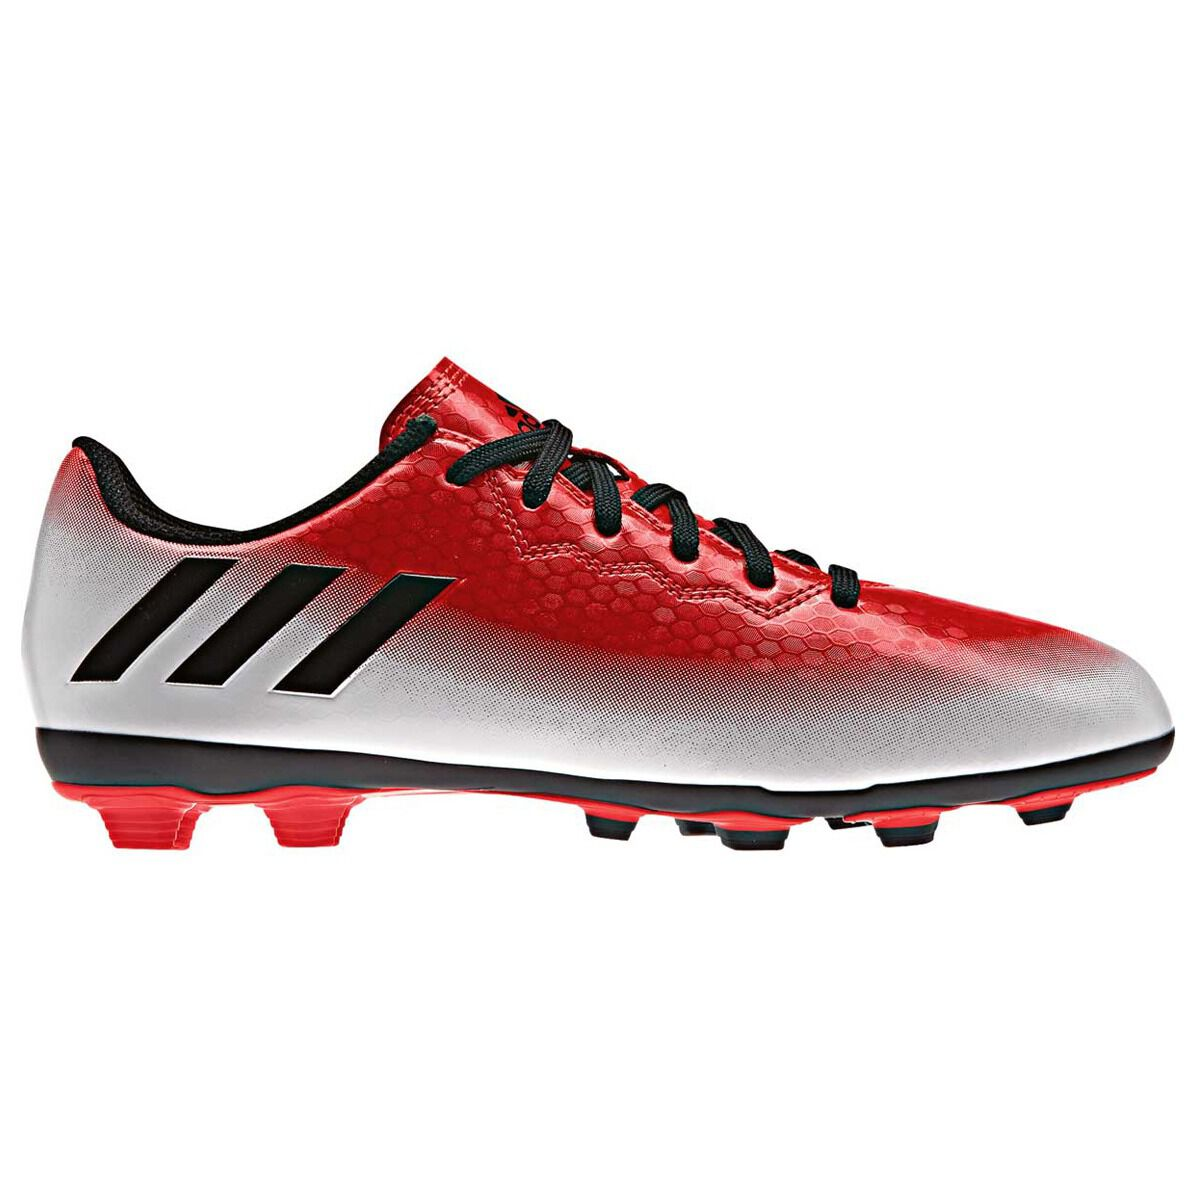 6db4f142b96e ... adidas messi 16.4 fxg junior football boots red black us 1 junior red